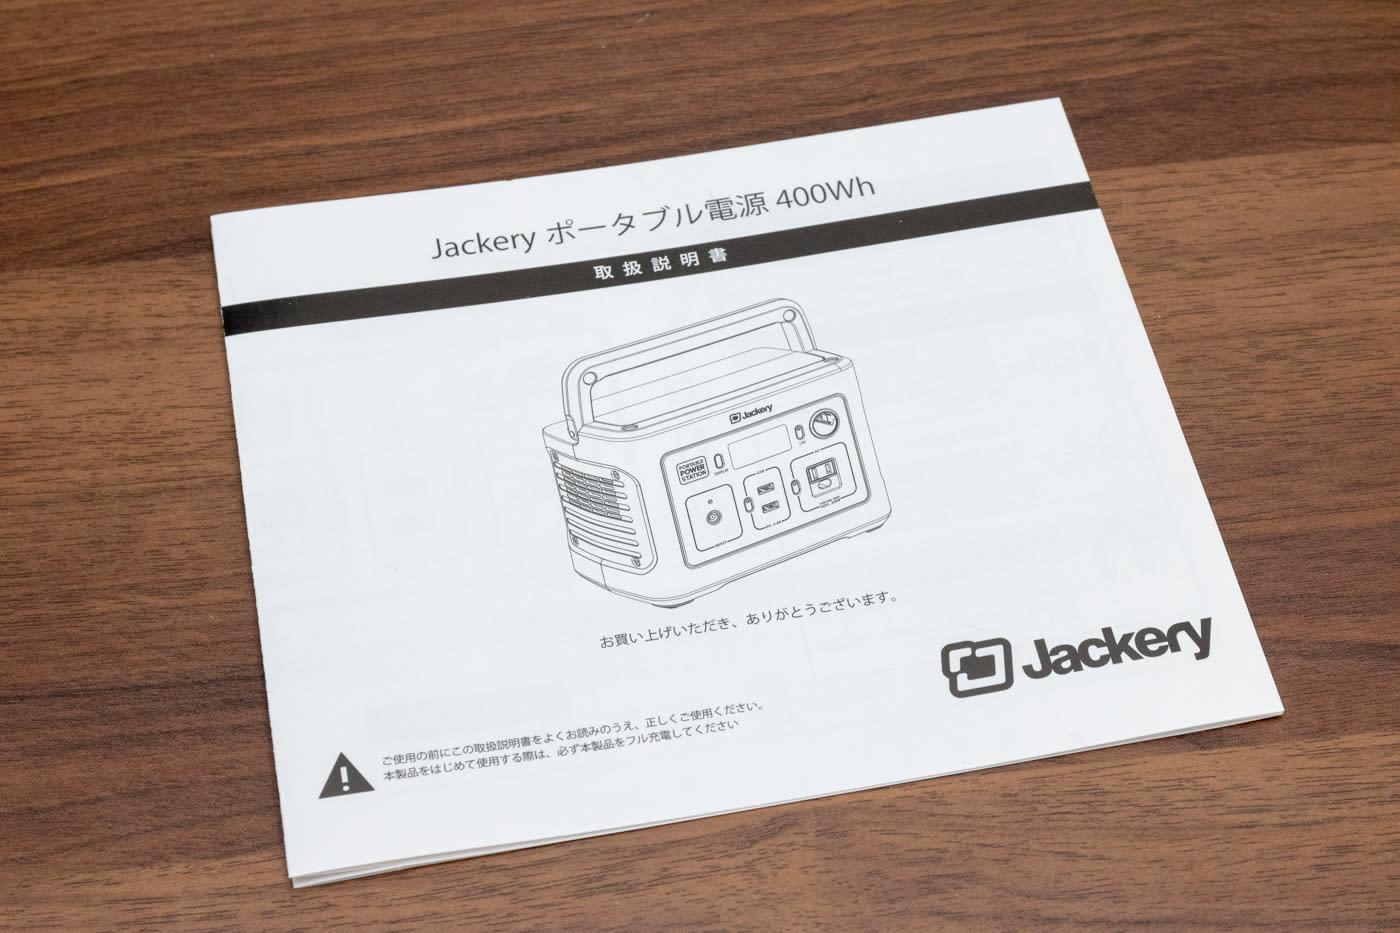 JacKeryポータブル電源